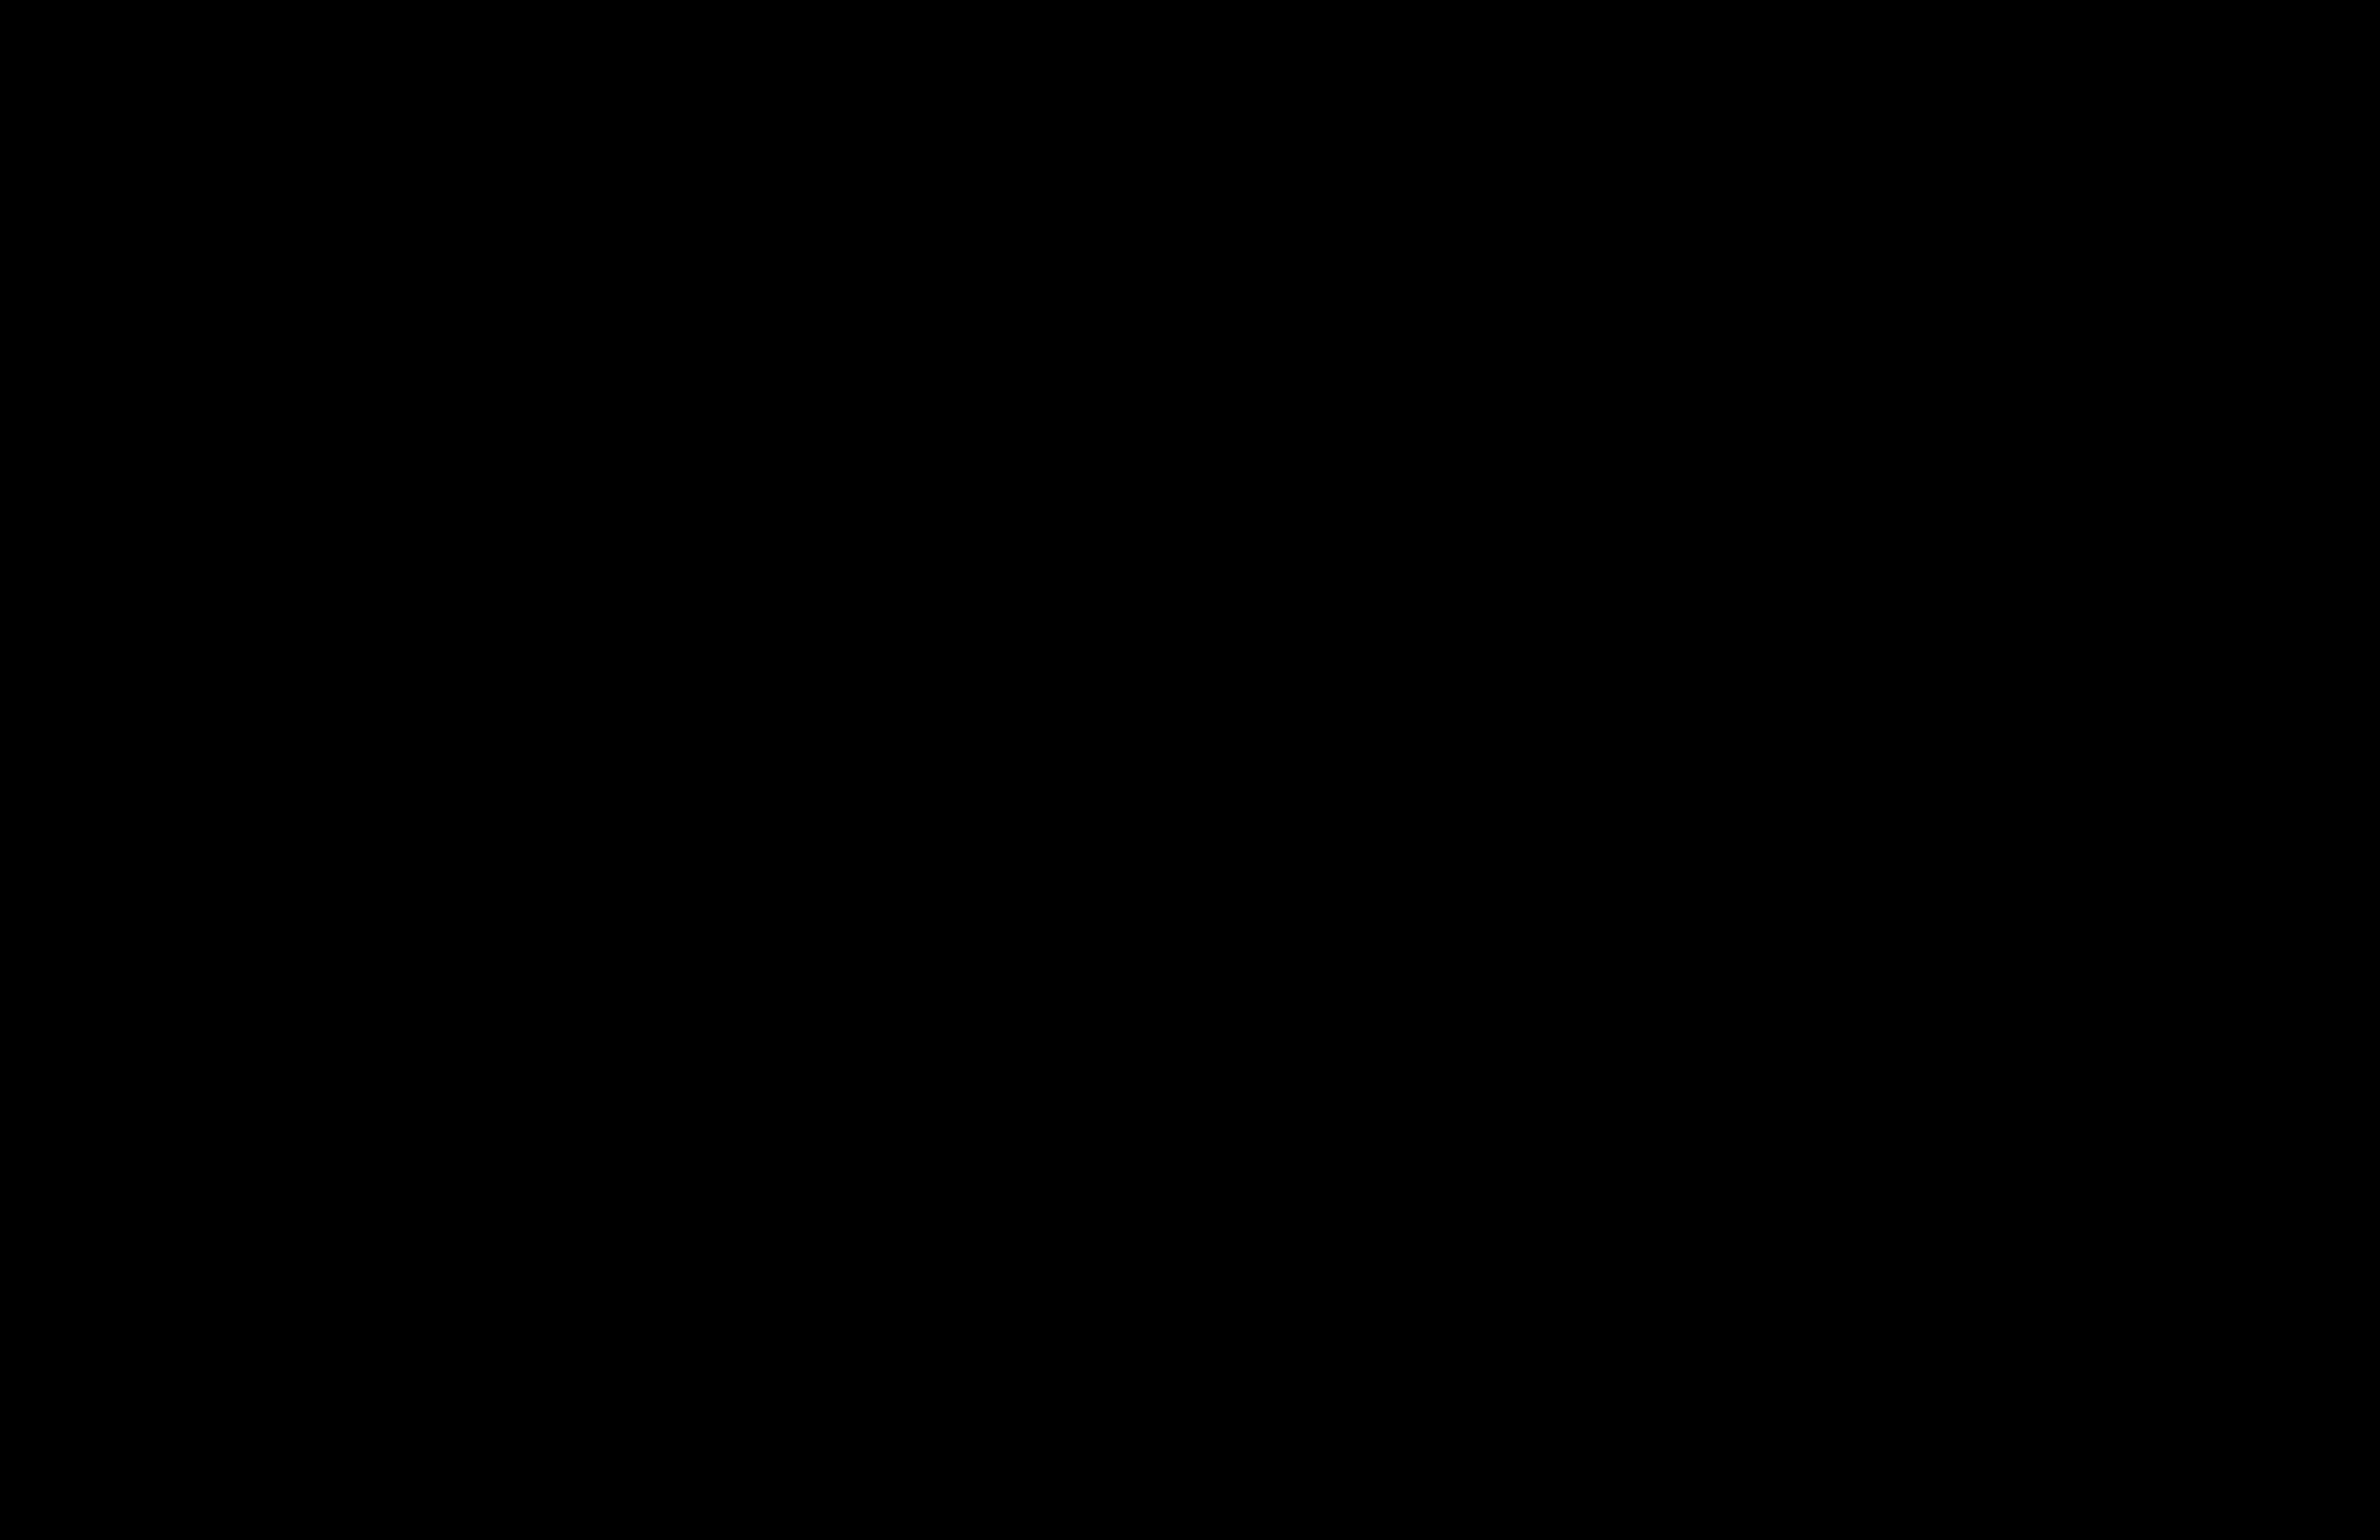 tr2205-17